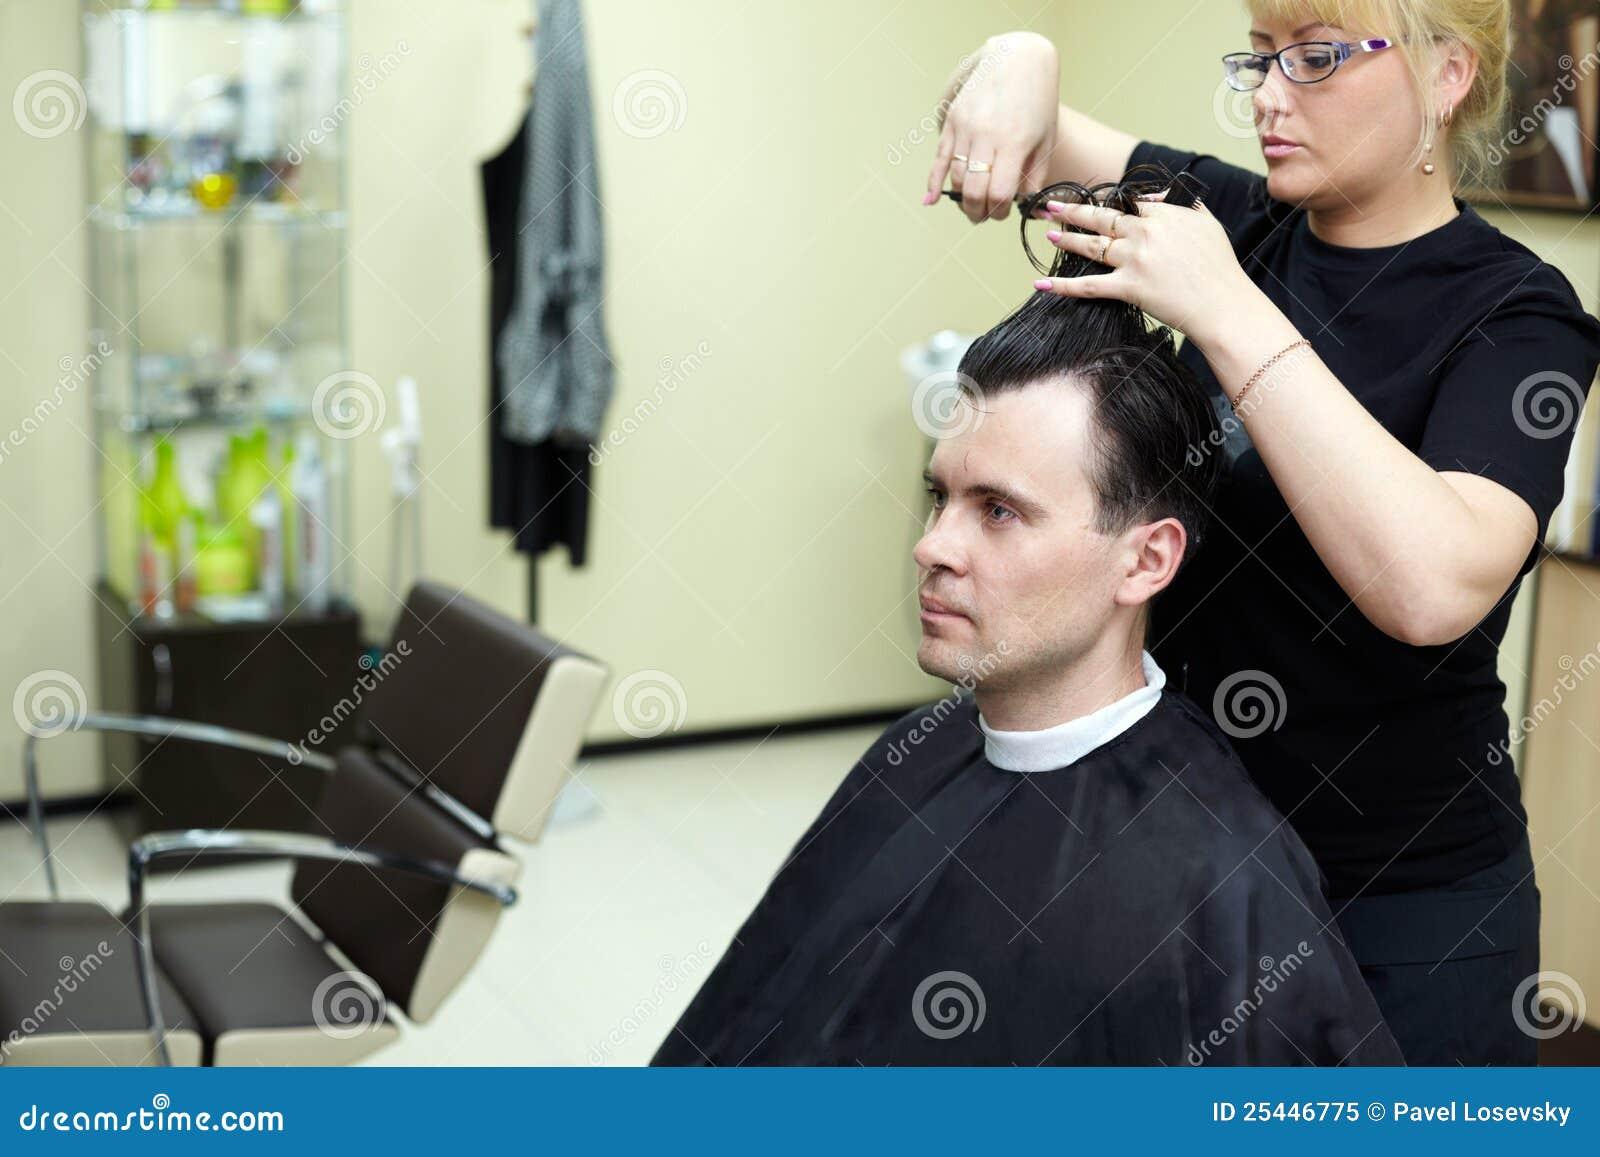 Female Hairdresser Cuts Man Hair Royalty Free Stock Photo